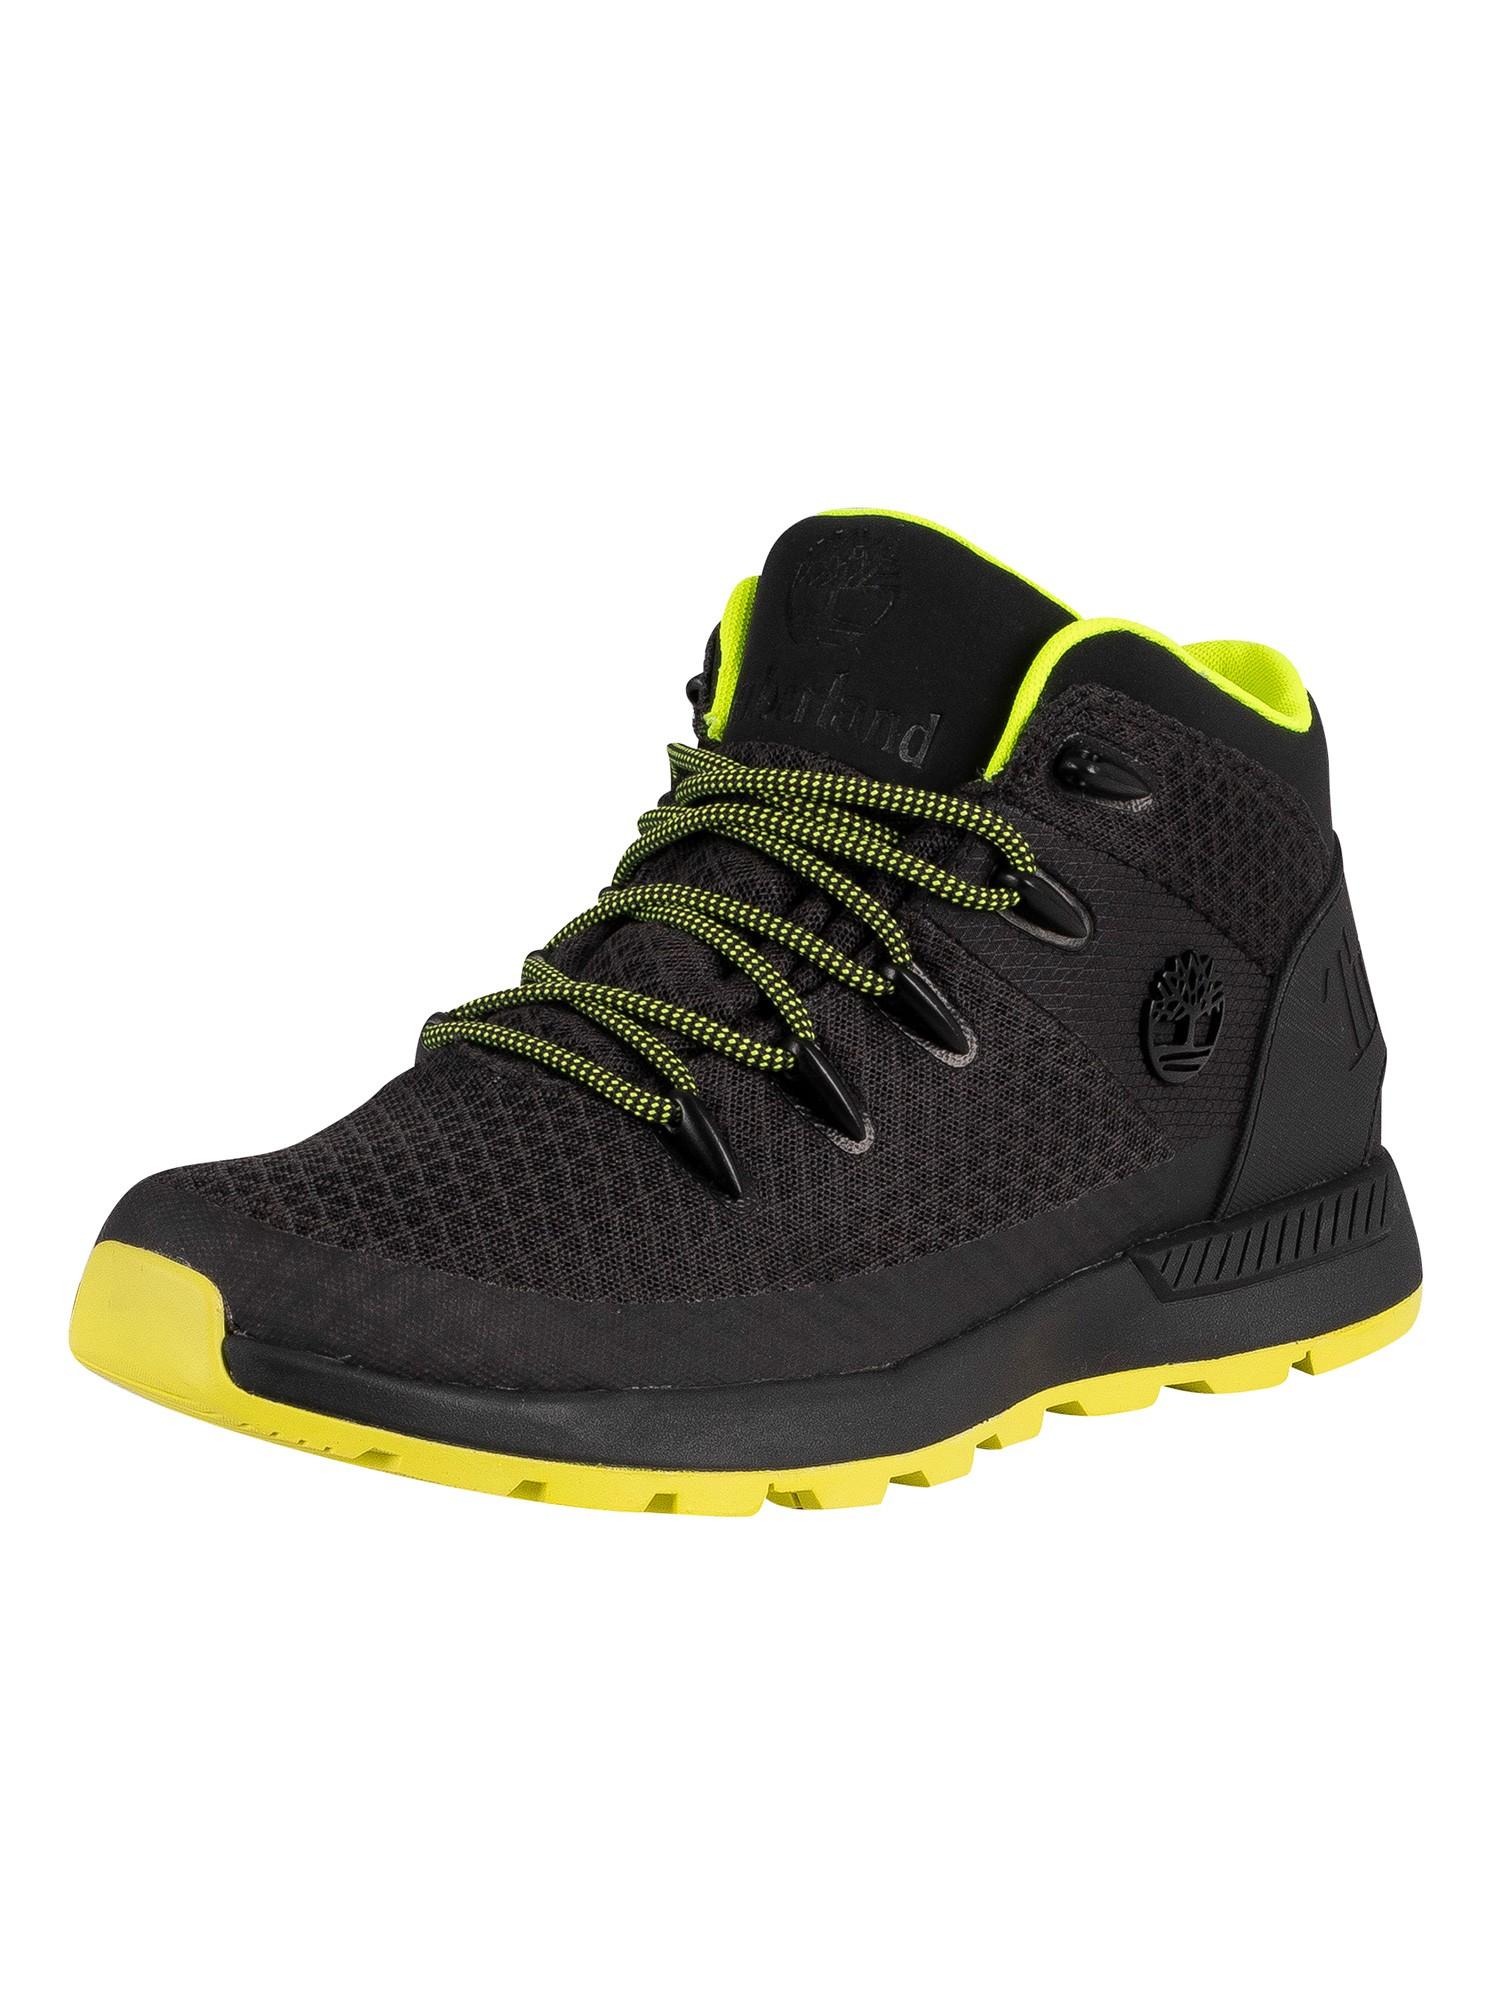 Sprint-Trekker-Mid-Boots